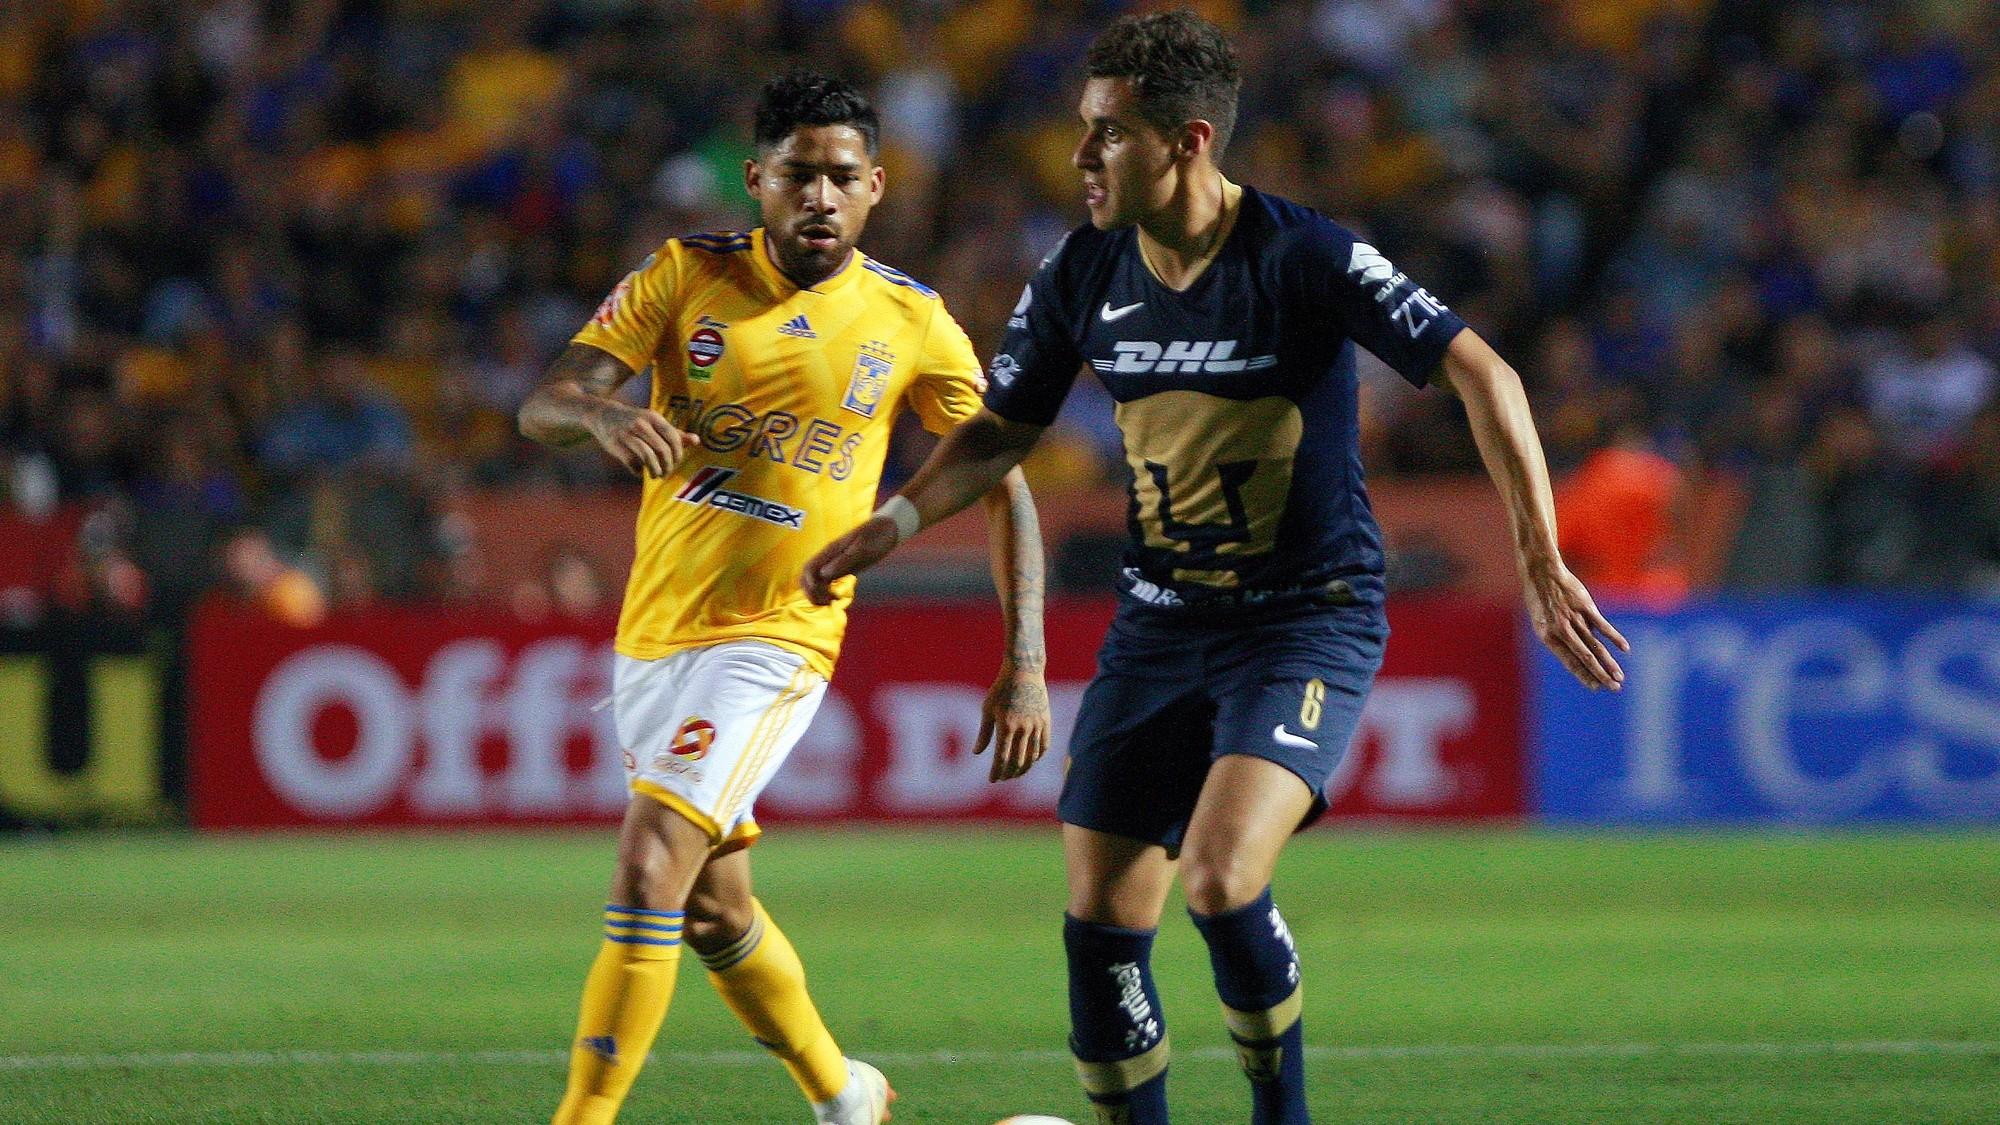 Ventana mundial Camello bordado  Qué canal transmite Pumas UNAM vs. Tigres UANL por la Liga MX   Bolavip